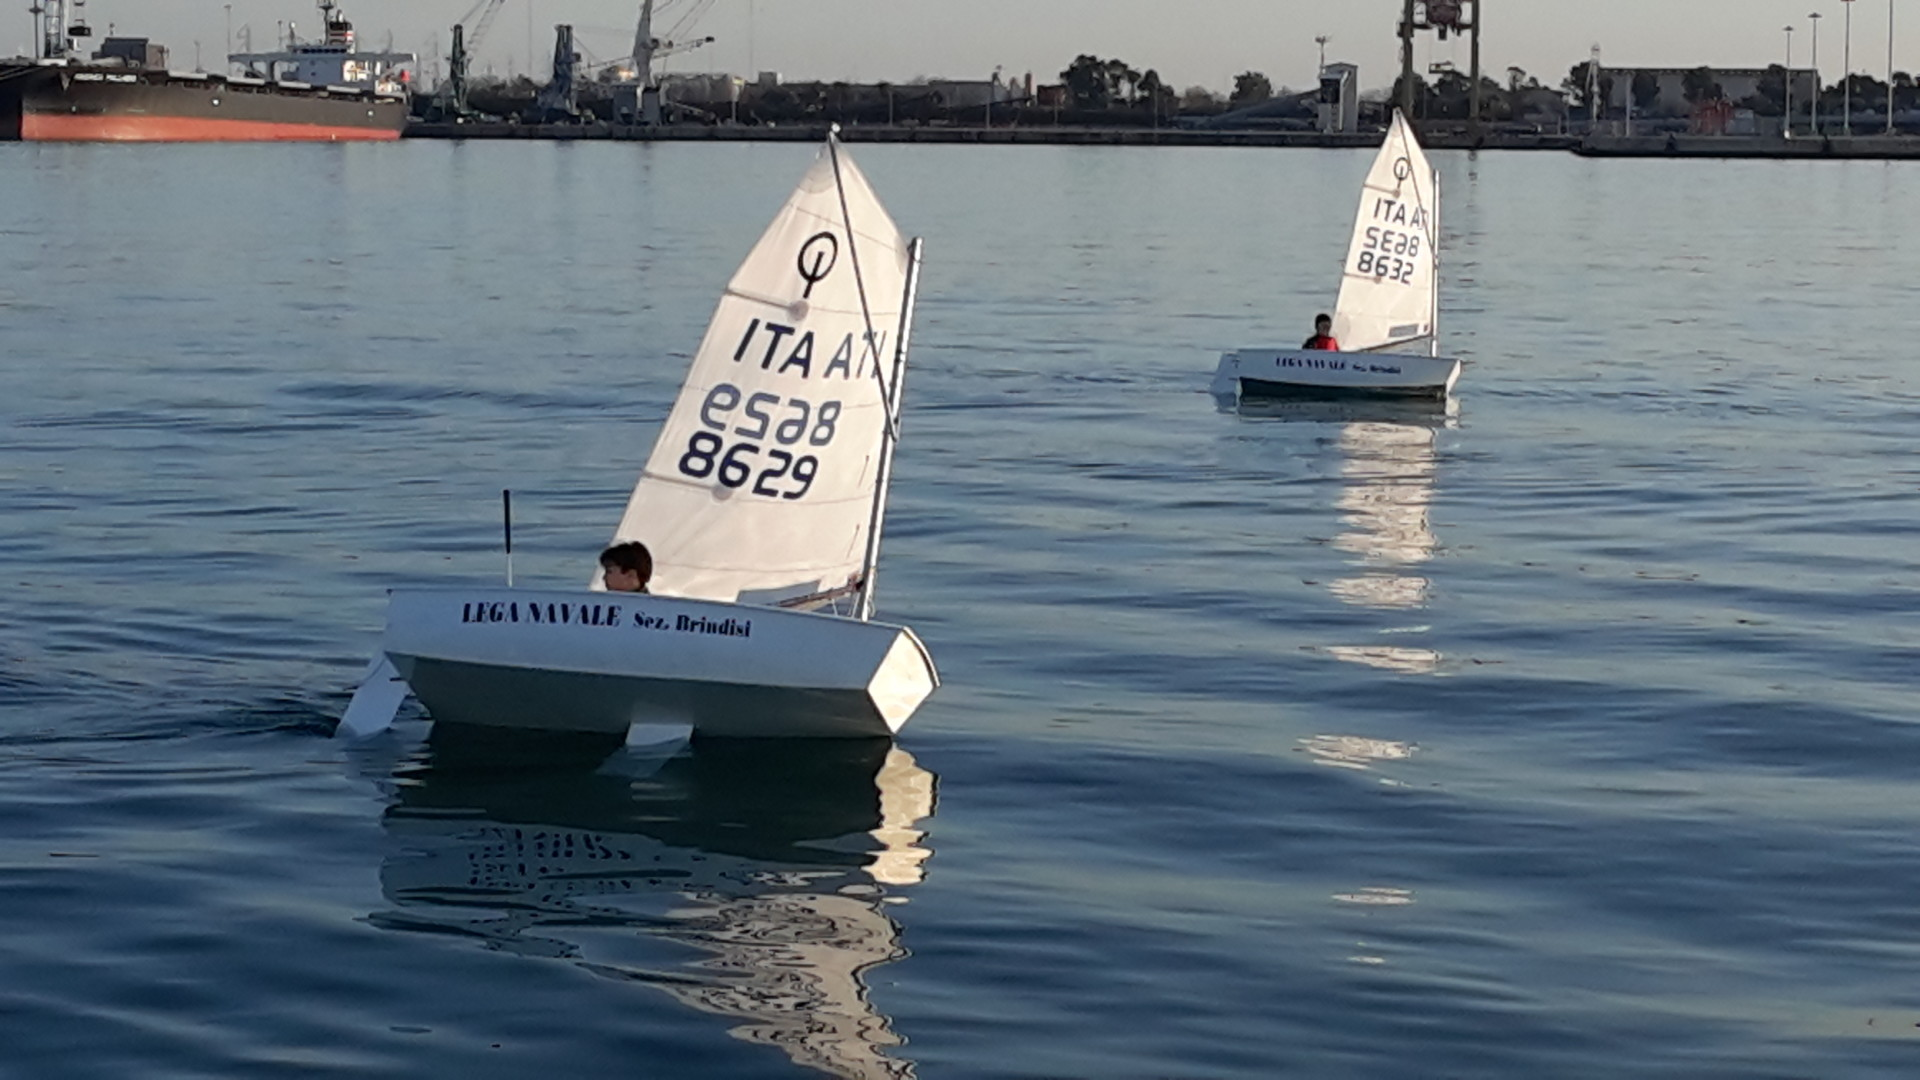 Scuola-di-vela-lega-navale-LNI-Brindisi (11)